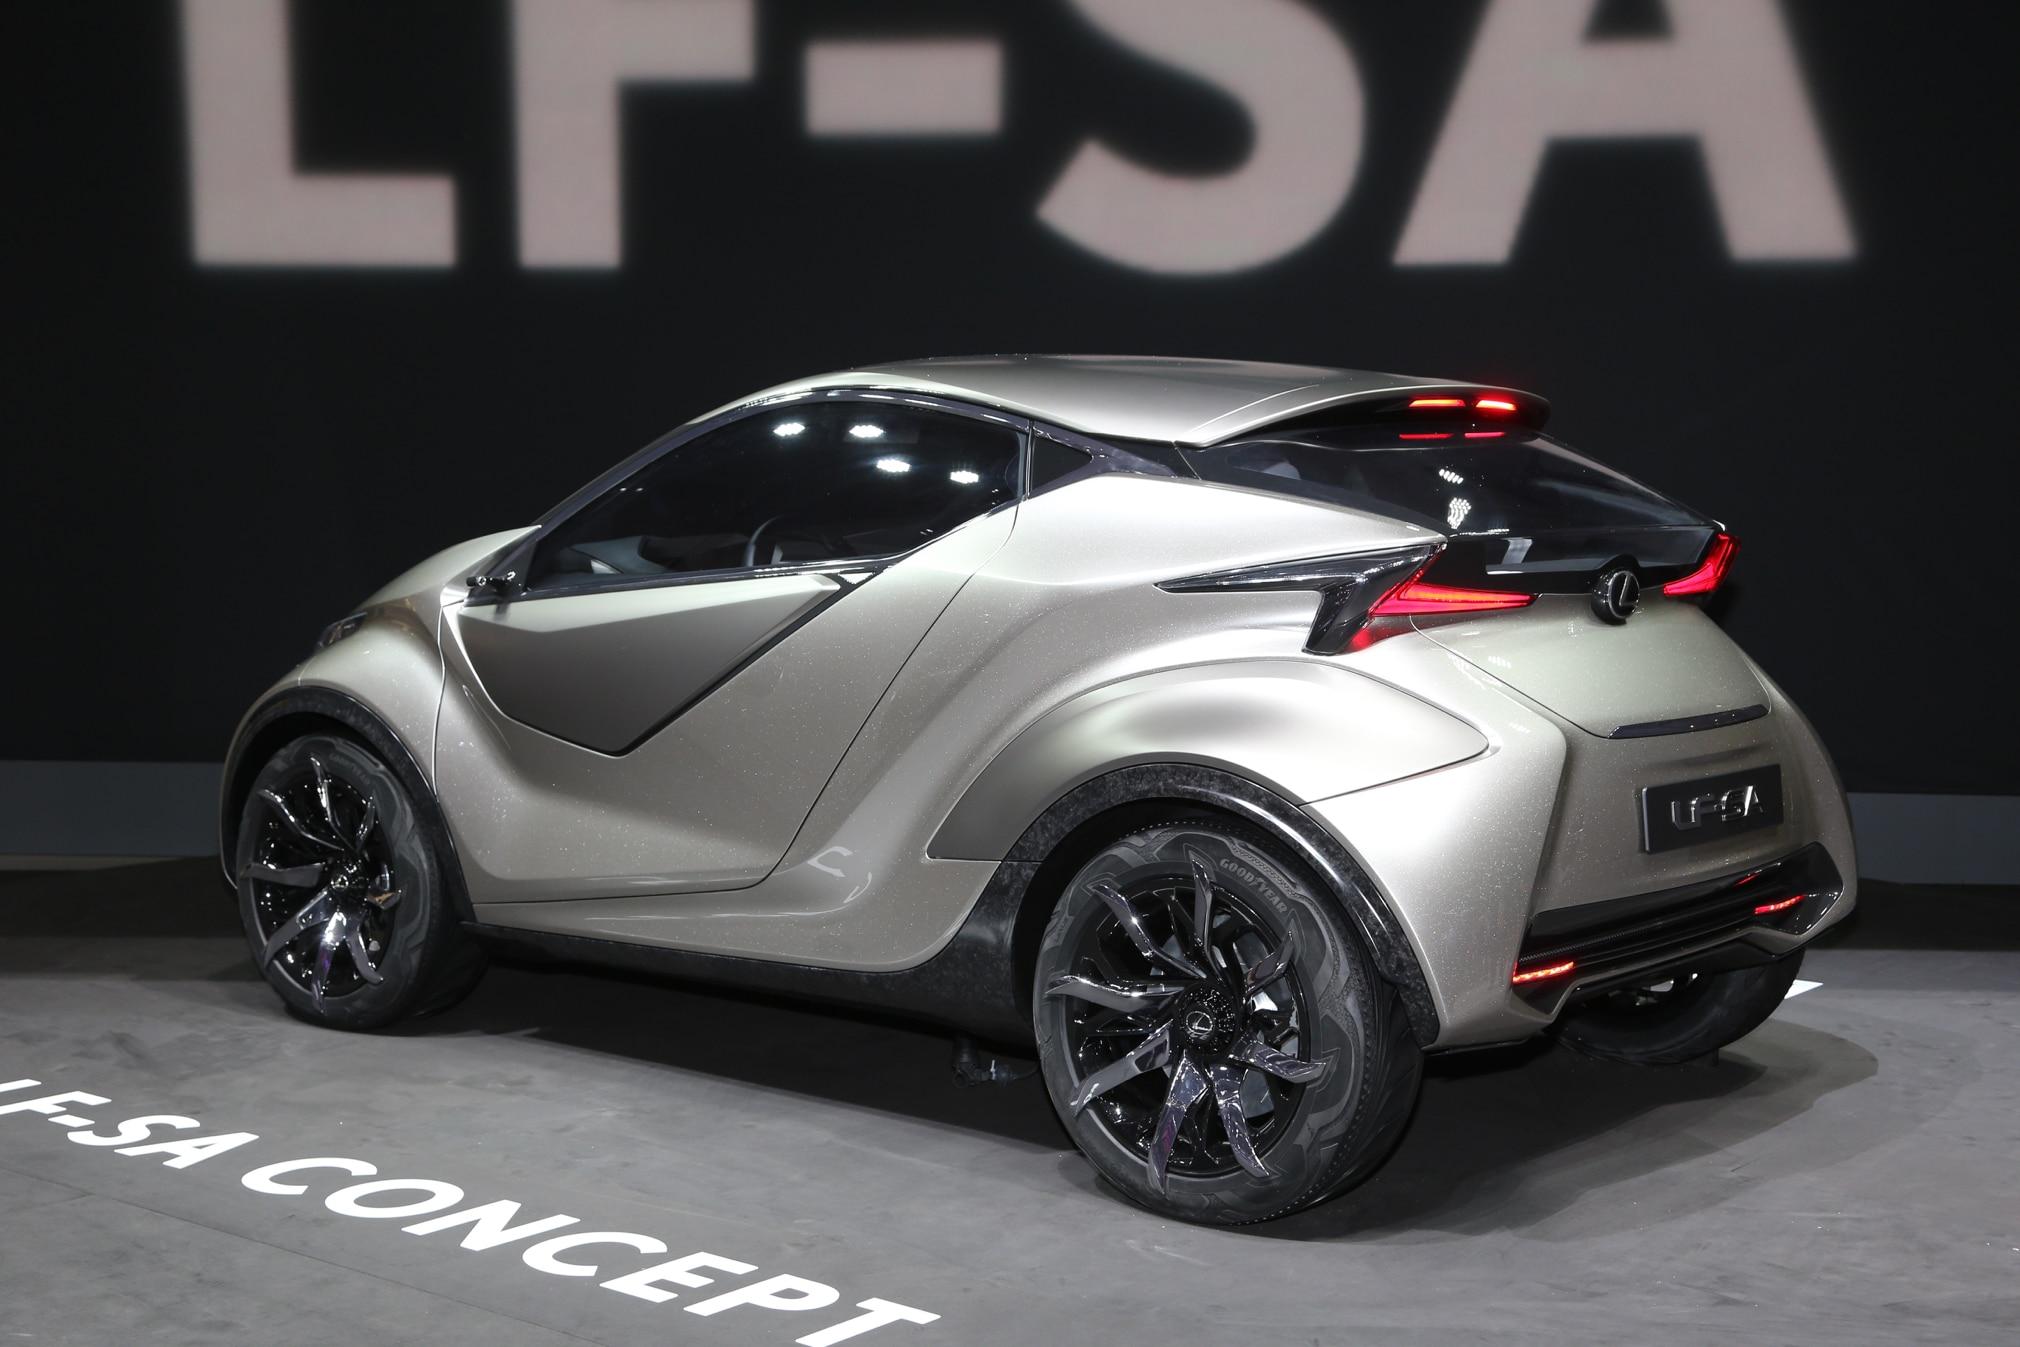 lexus lf-sa city car concept arrives in geneva